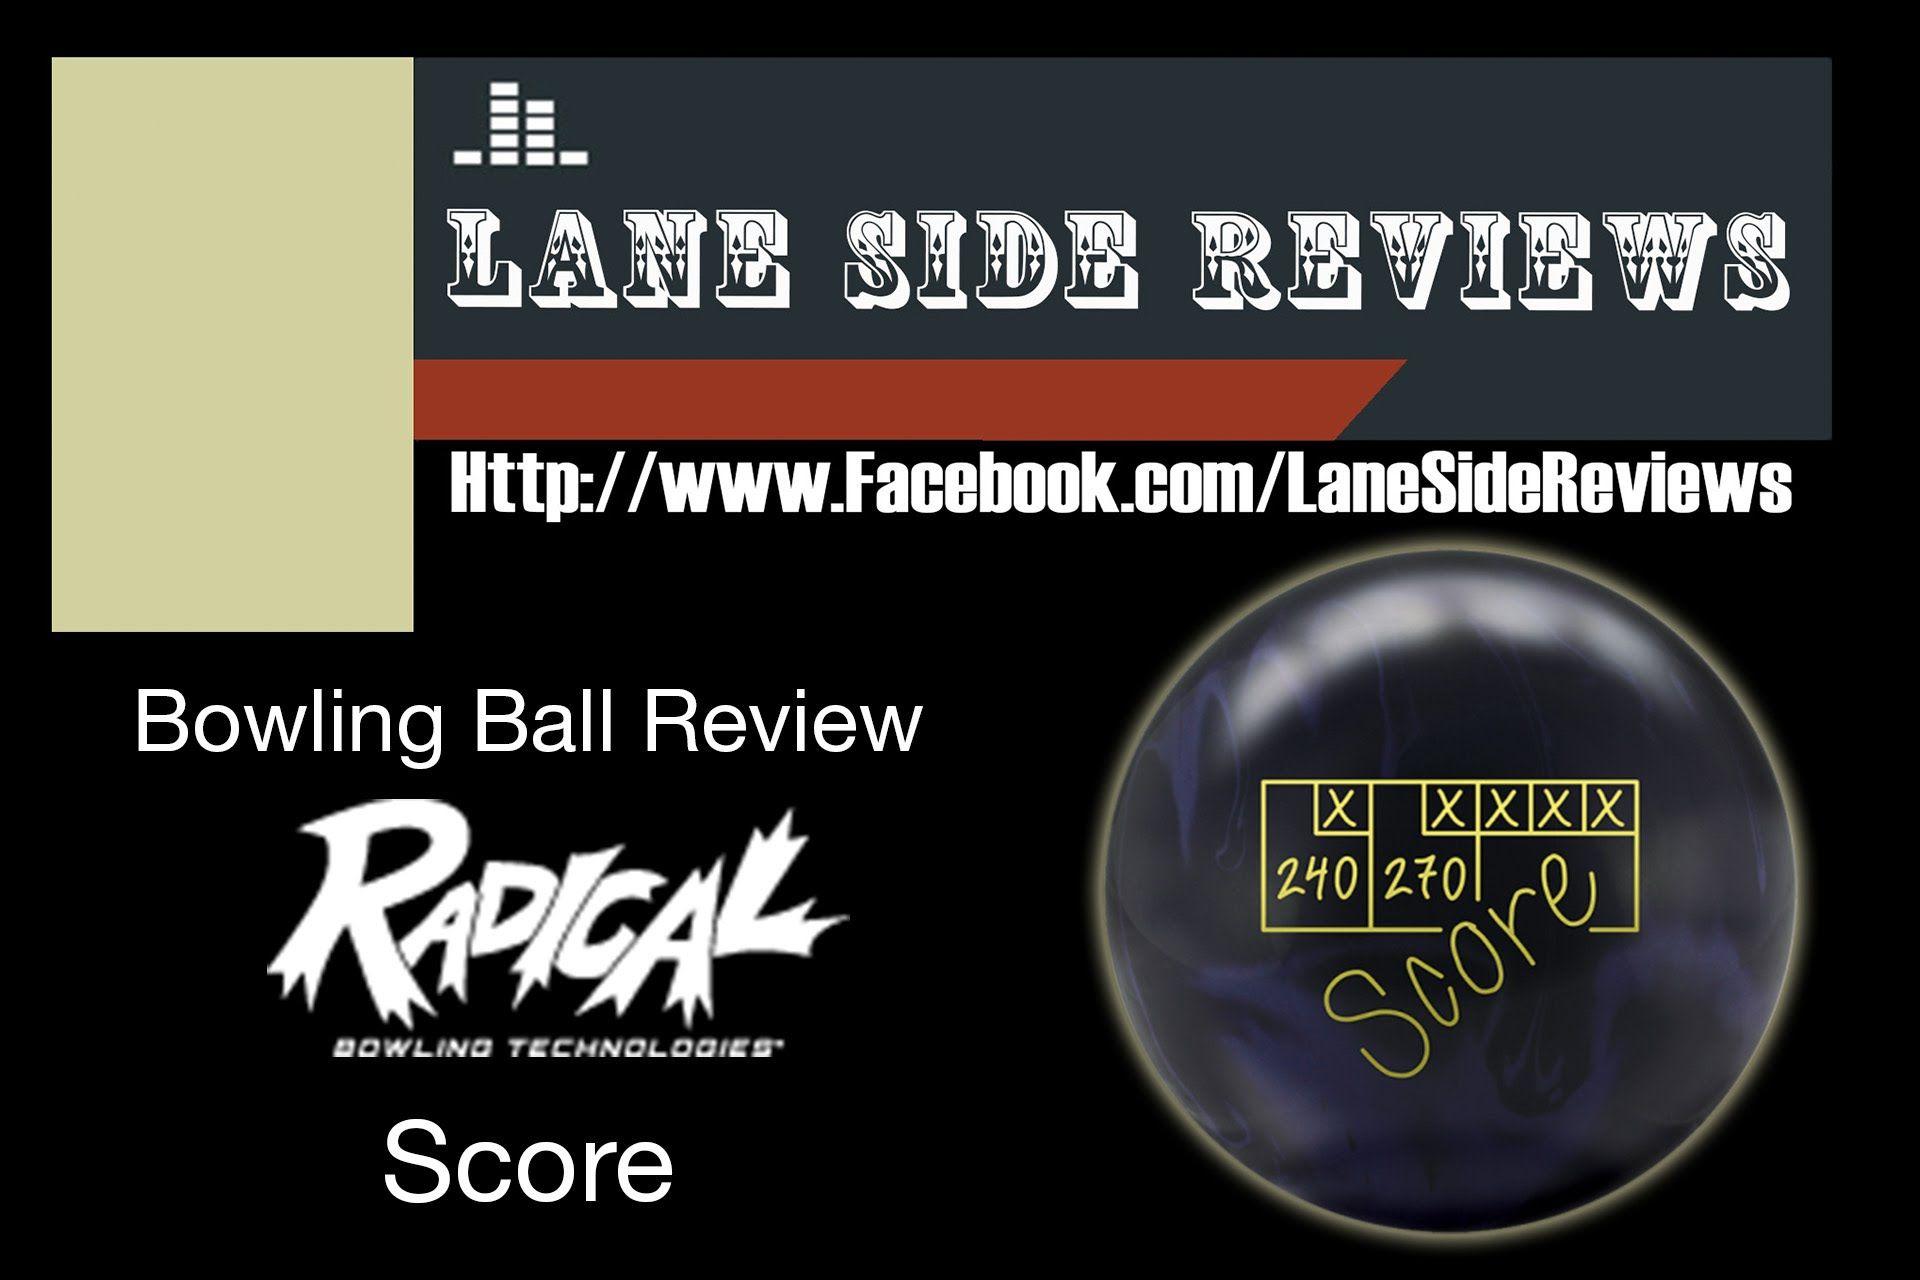 Radical Score by Lane Side Reviews